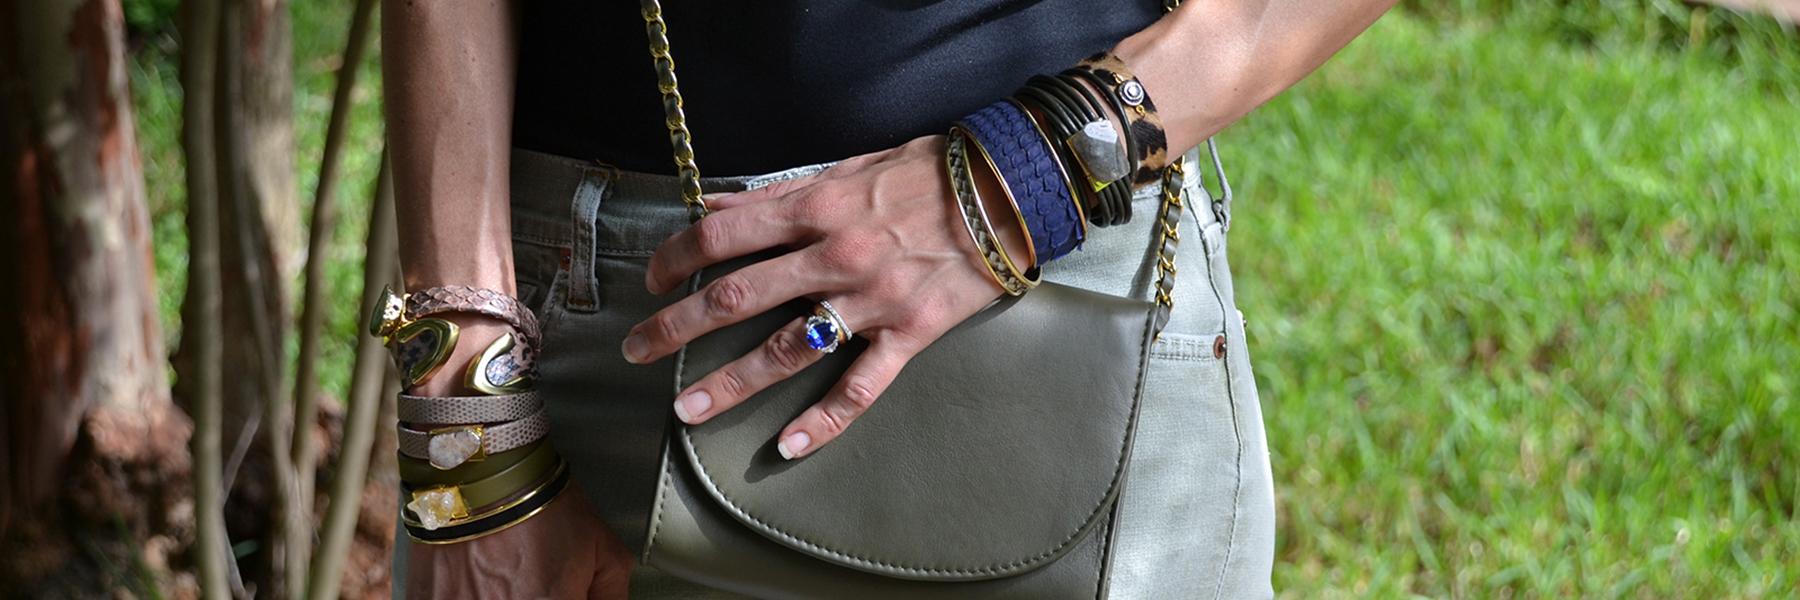 shop-helene-thomas-bracelets.jpg